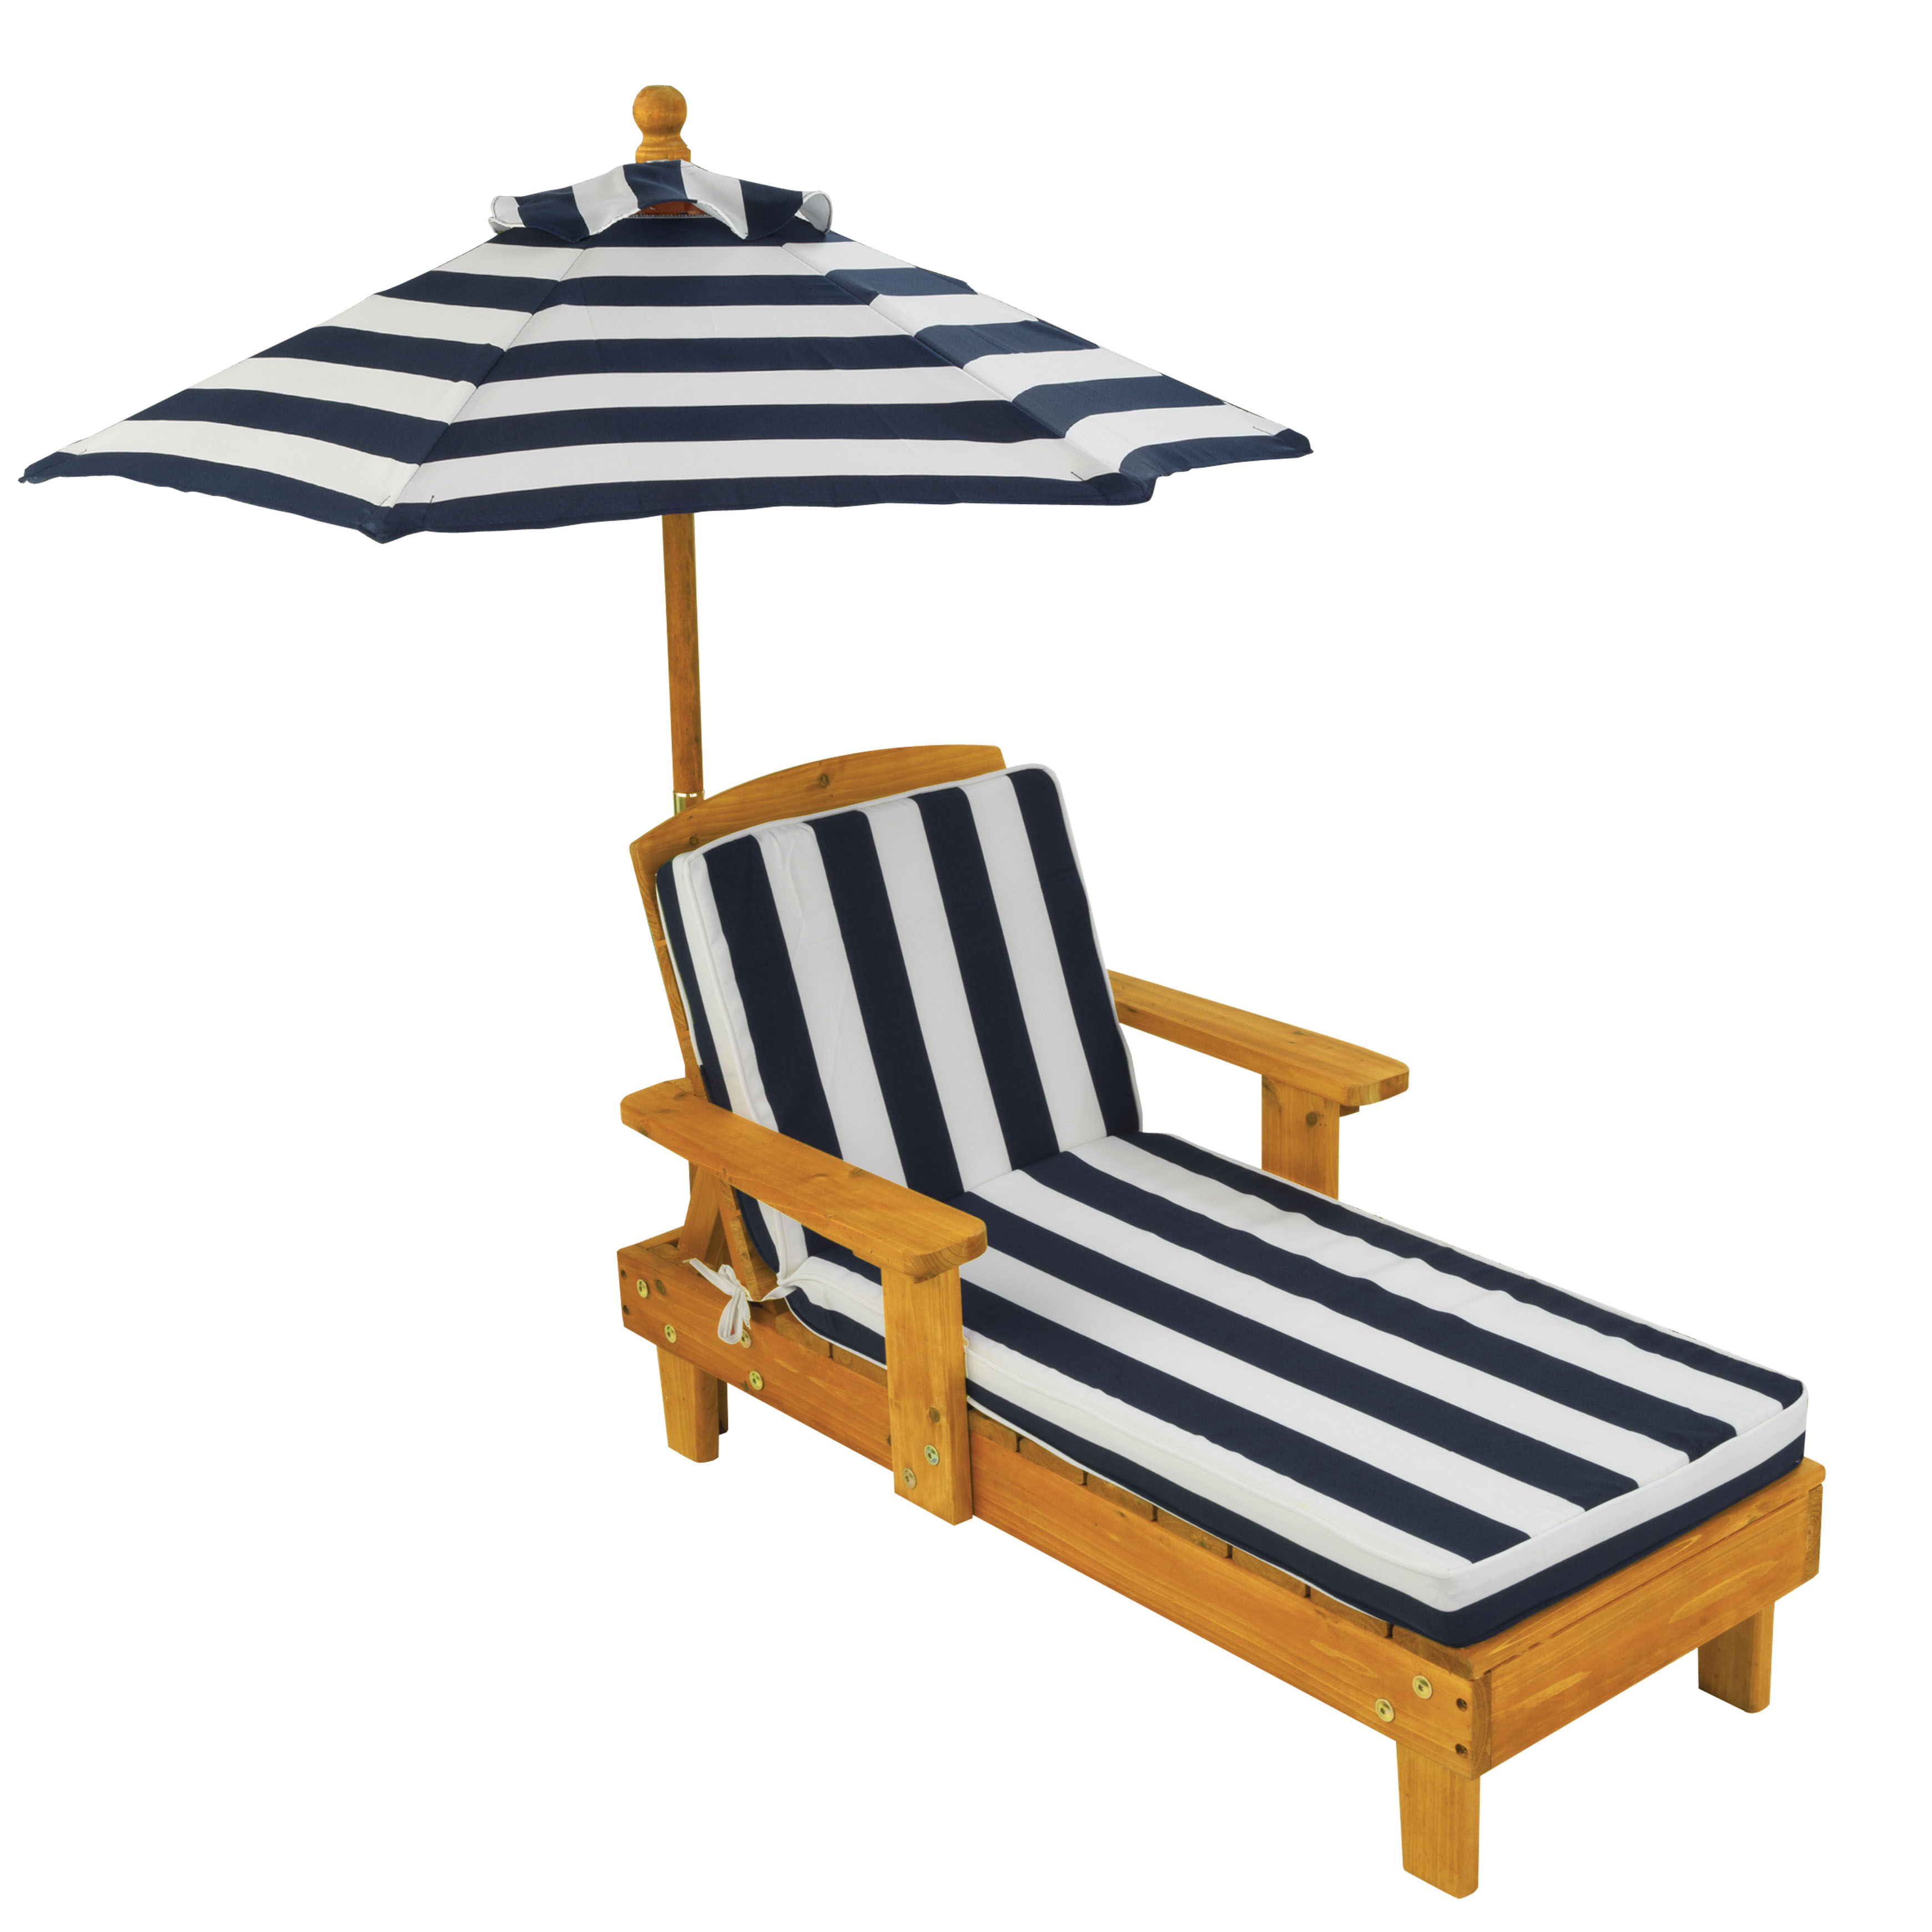 KidKraft Outdoor Chaise with Umbrella Navy by KidKraft